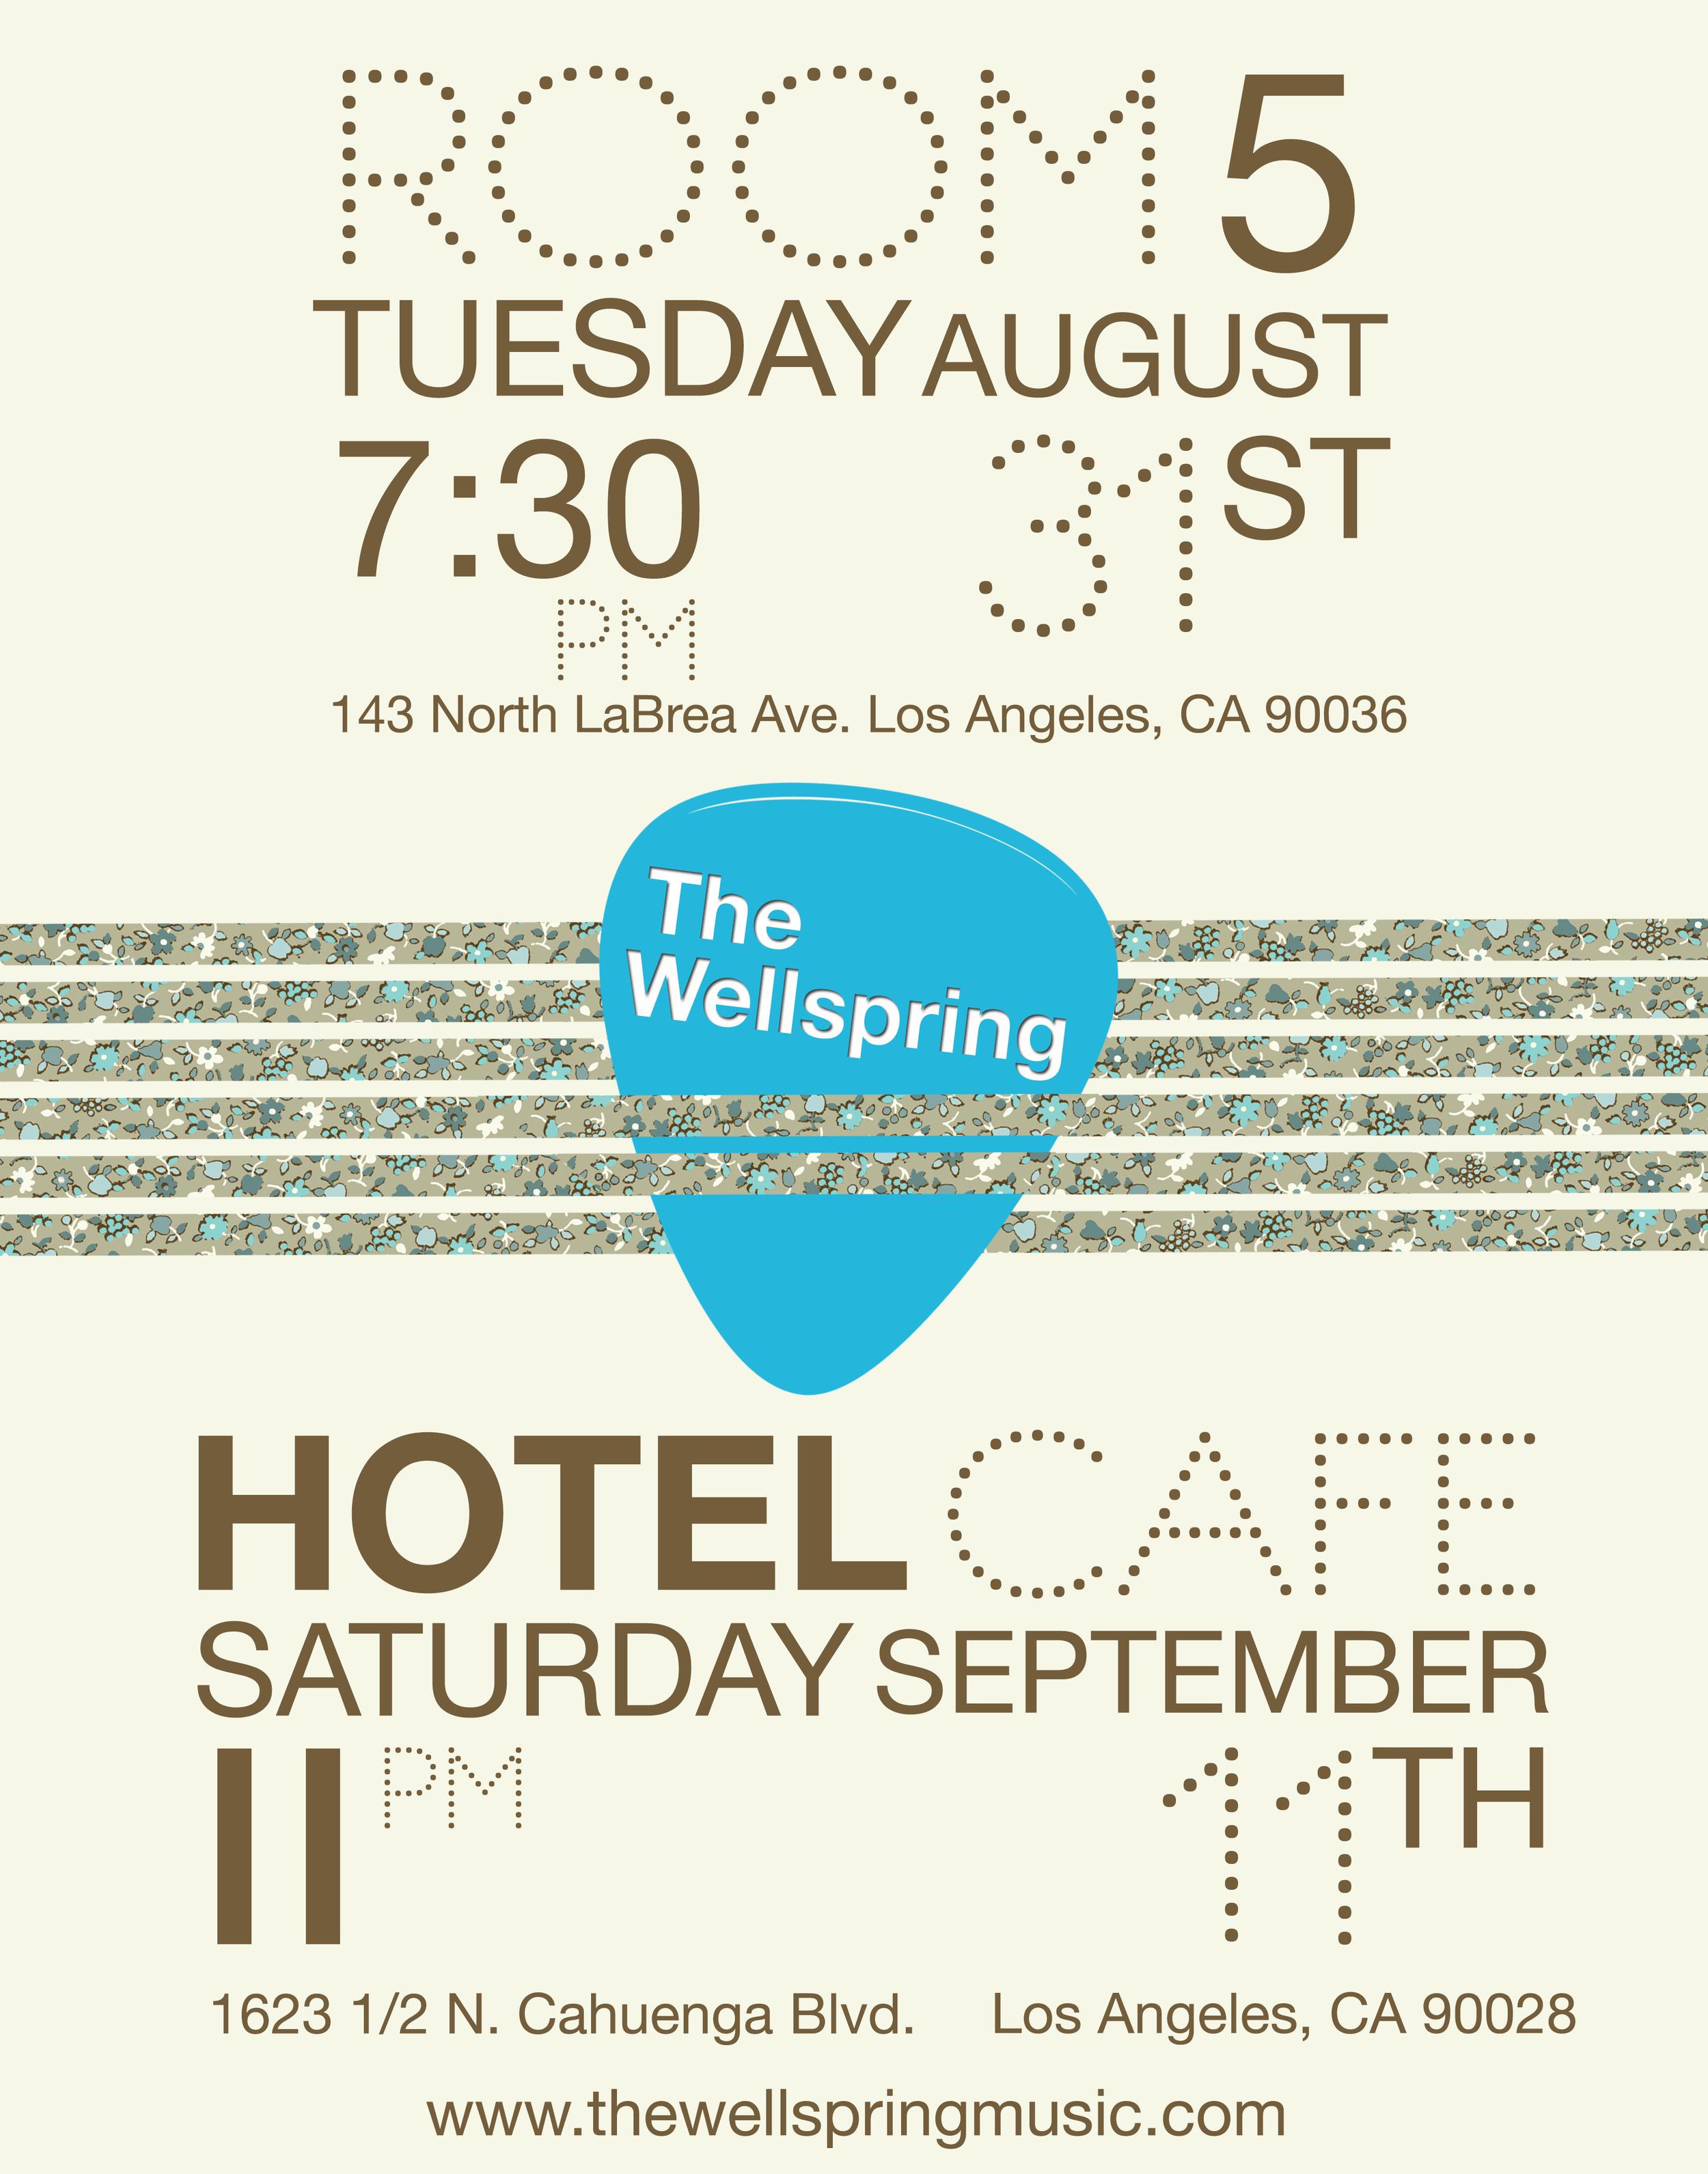 TheWellspring ConcertsPRINT.jpg